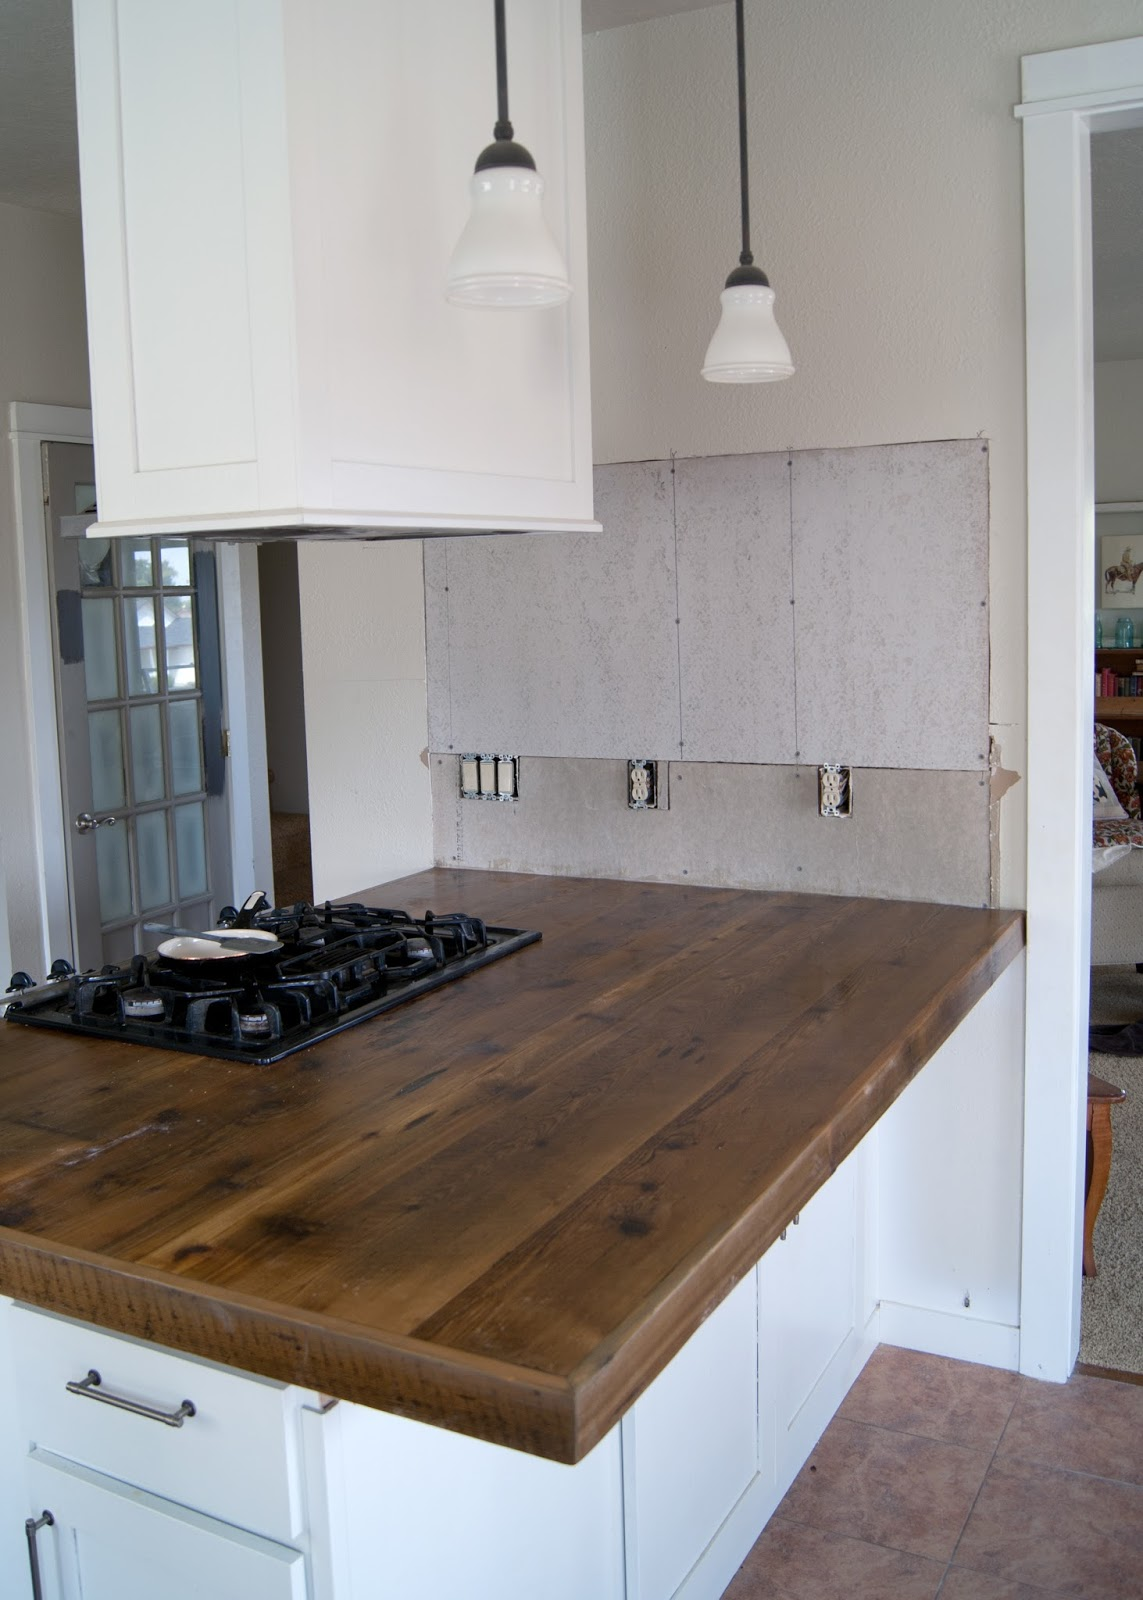 Diy Reclaimed Wood Countertop Afte